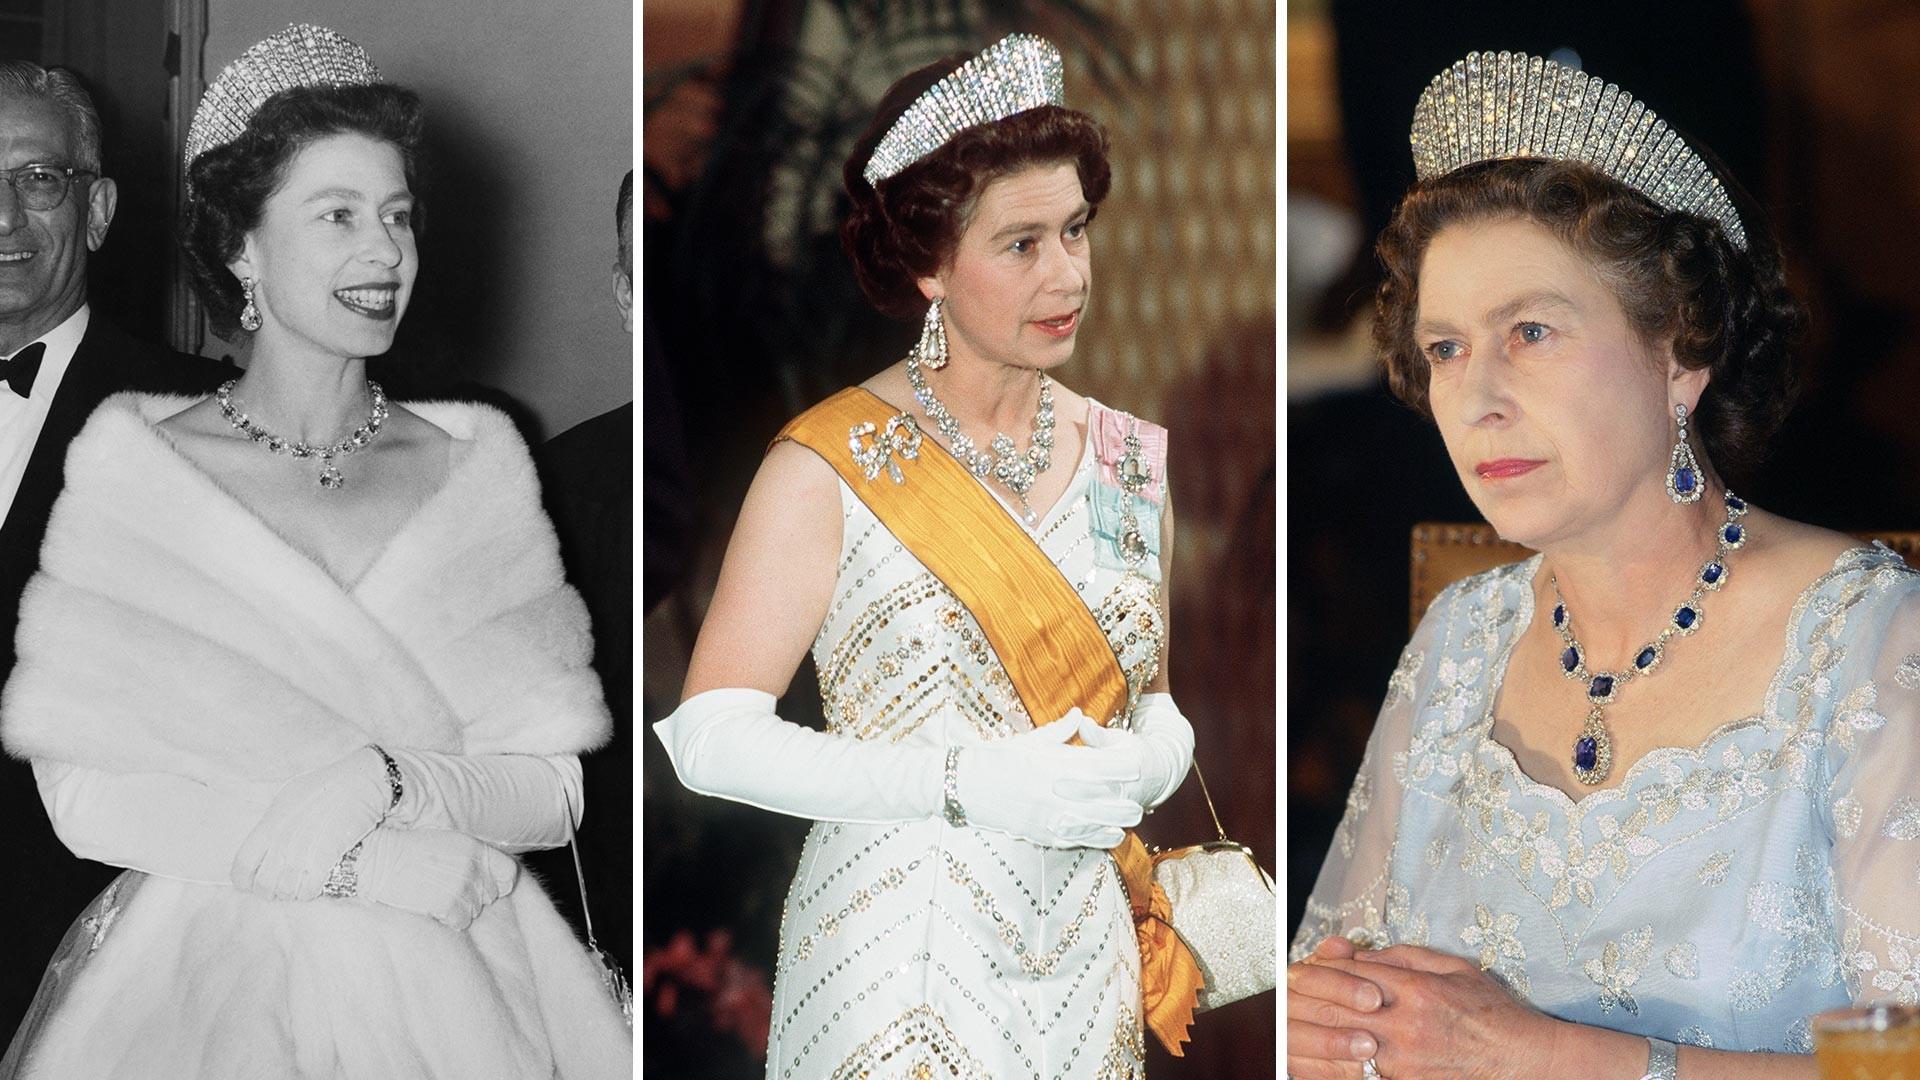 Élisabeth II en 1961, 1975 et 1983